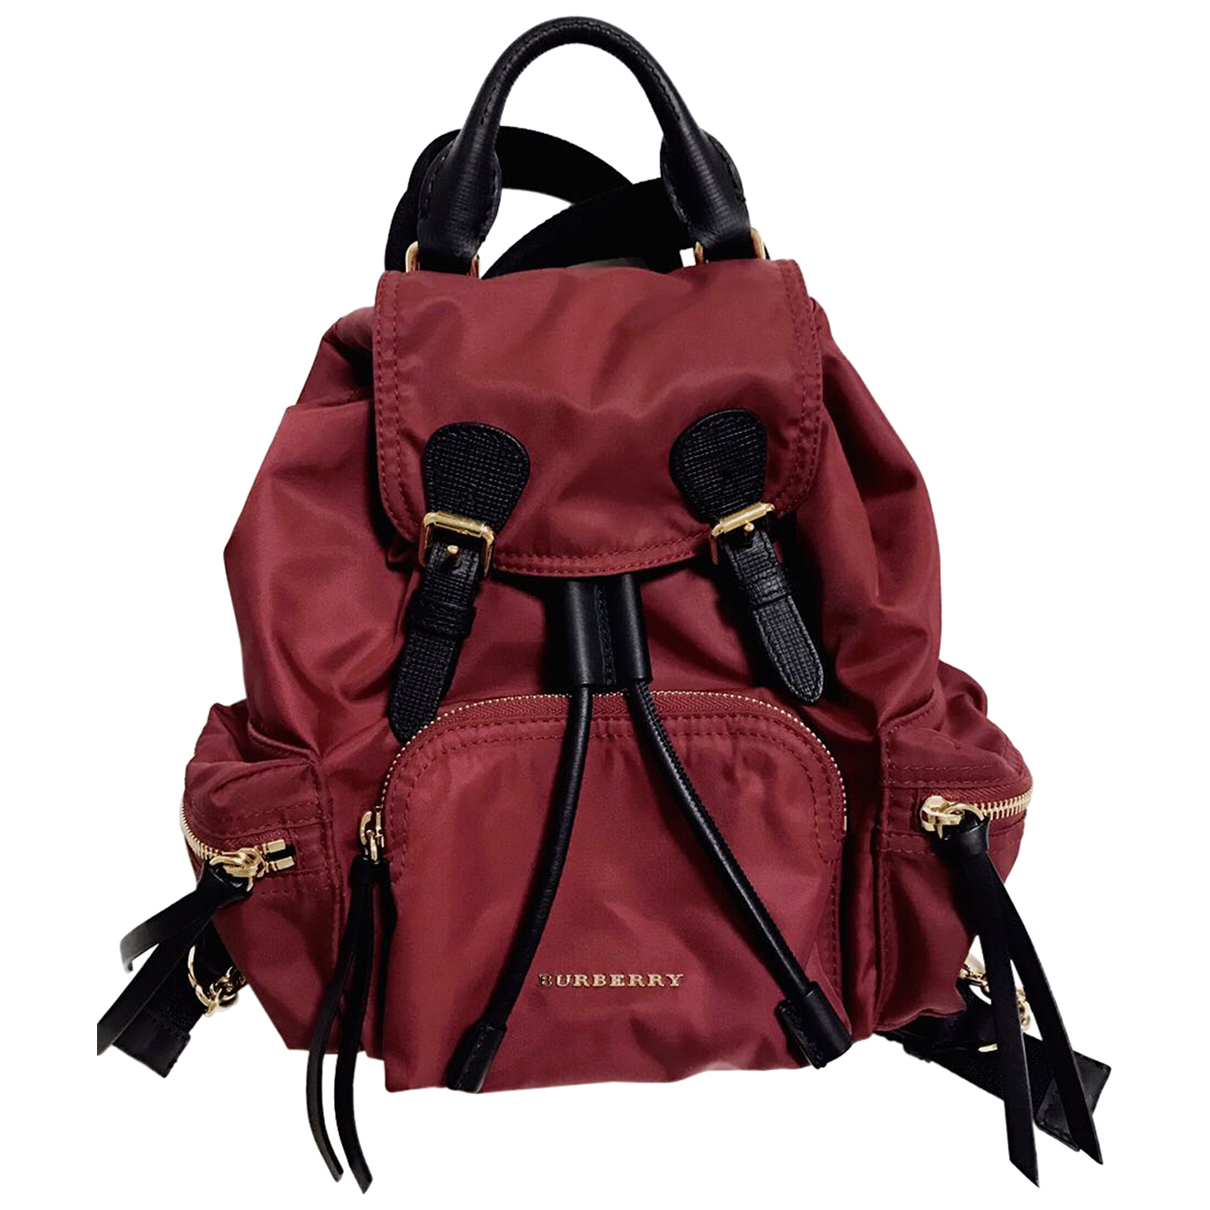 Burberry The Rucksack Burgundy backpack for Women \N